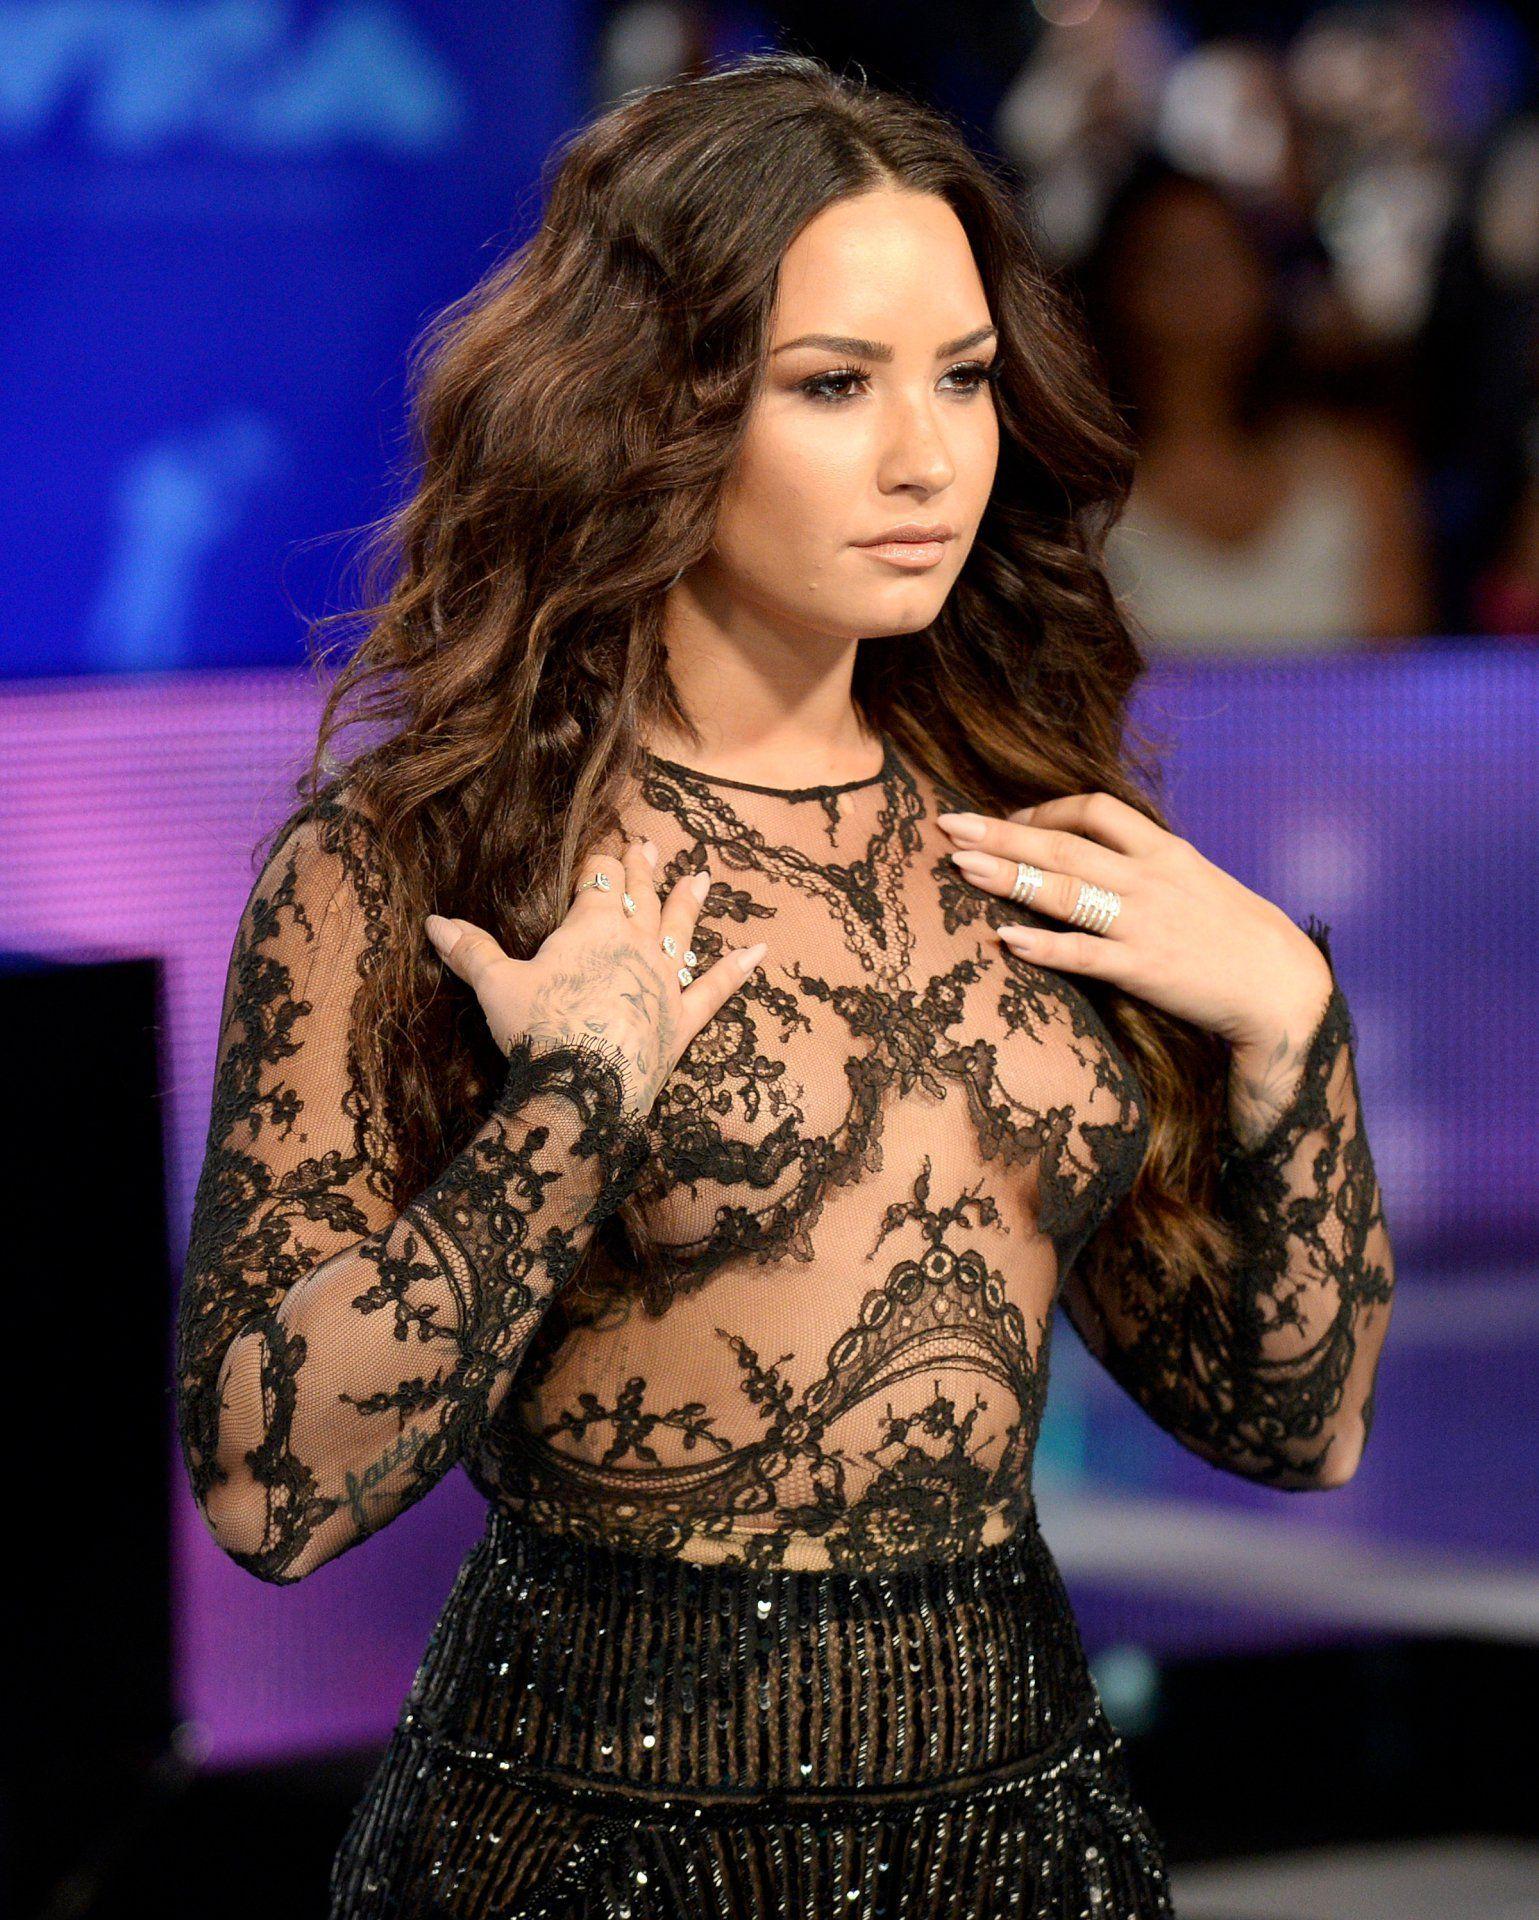 Demi Lovato vídeos porno